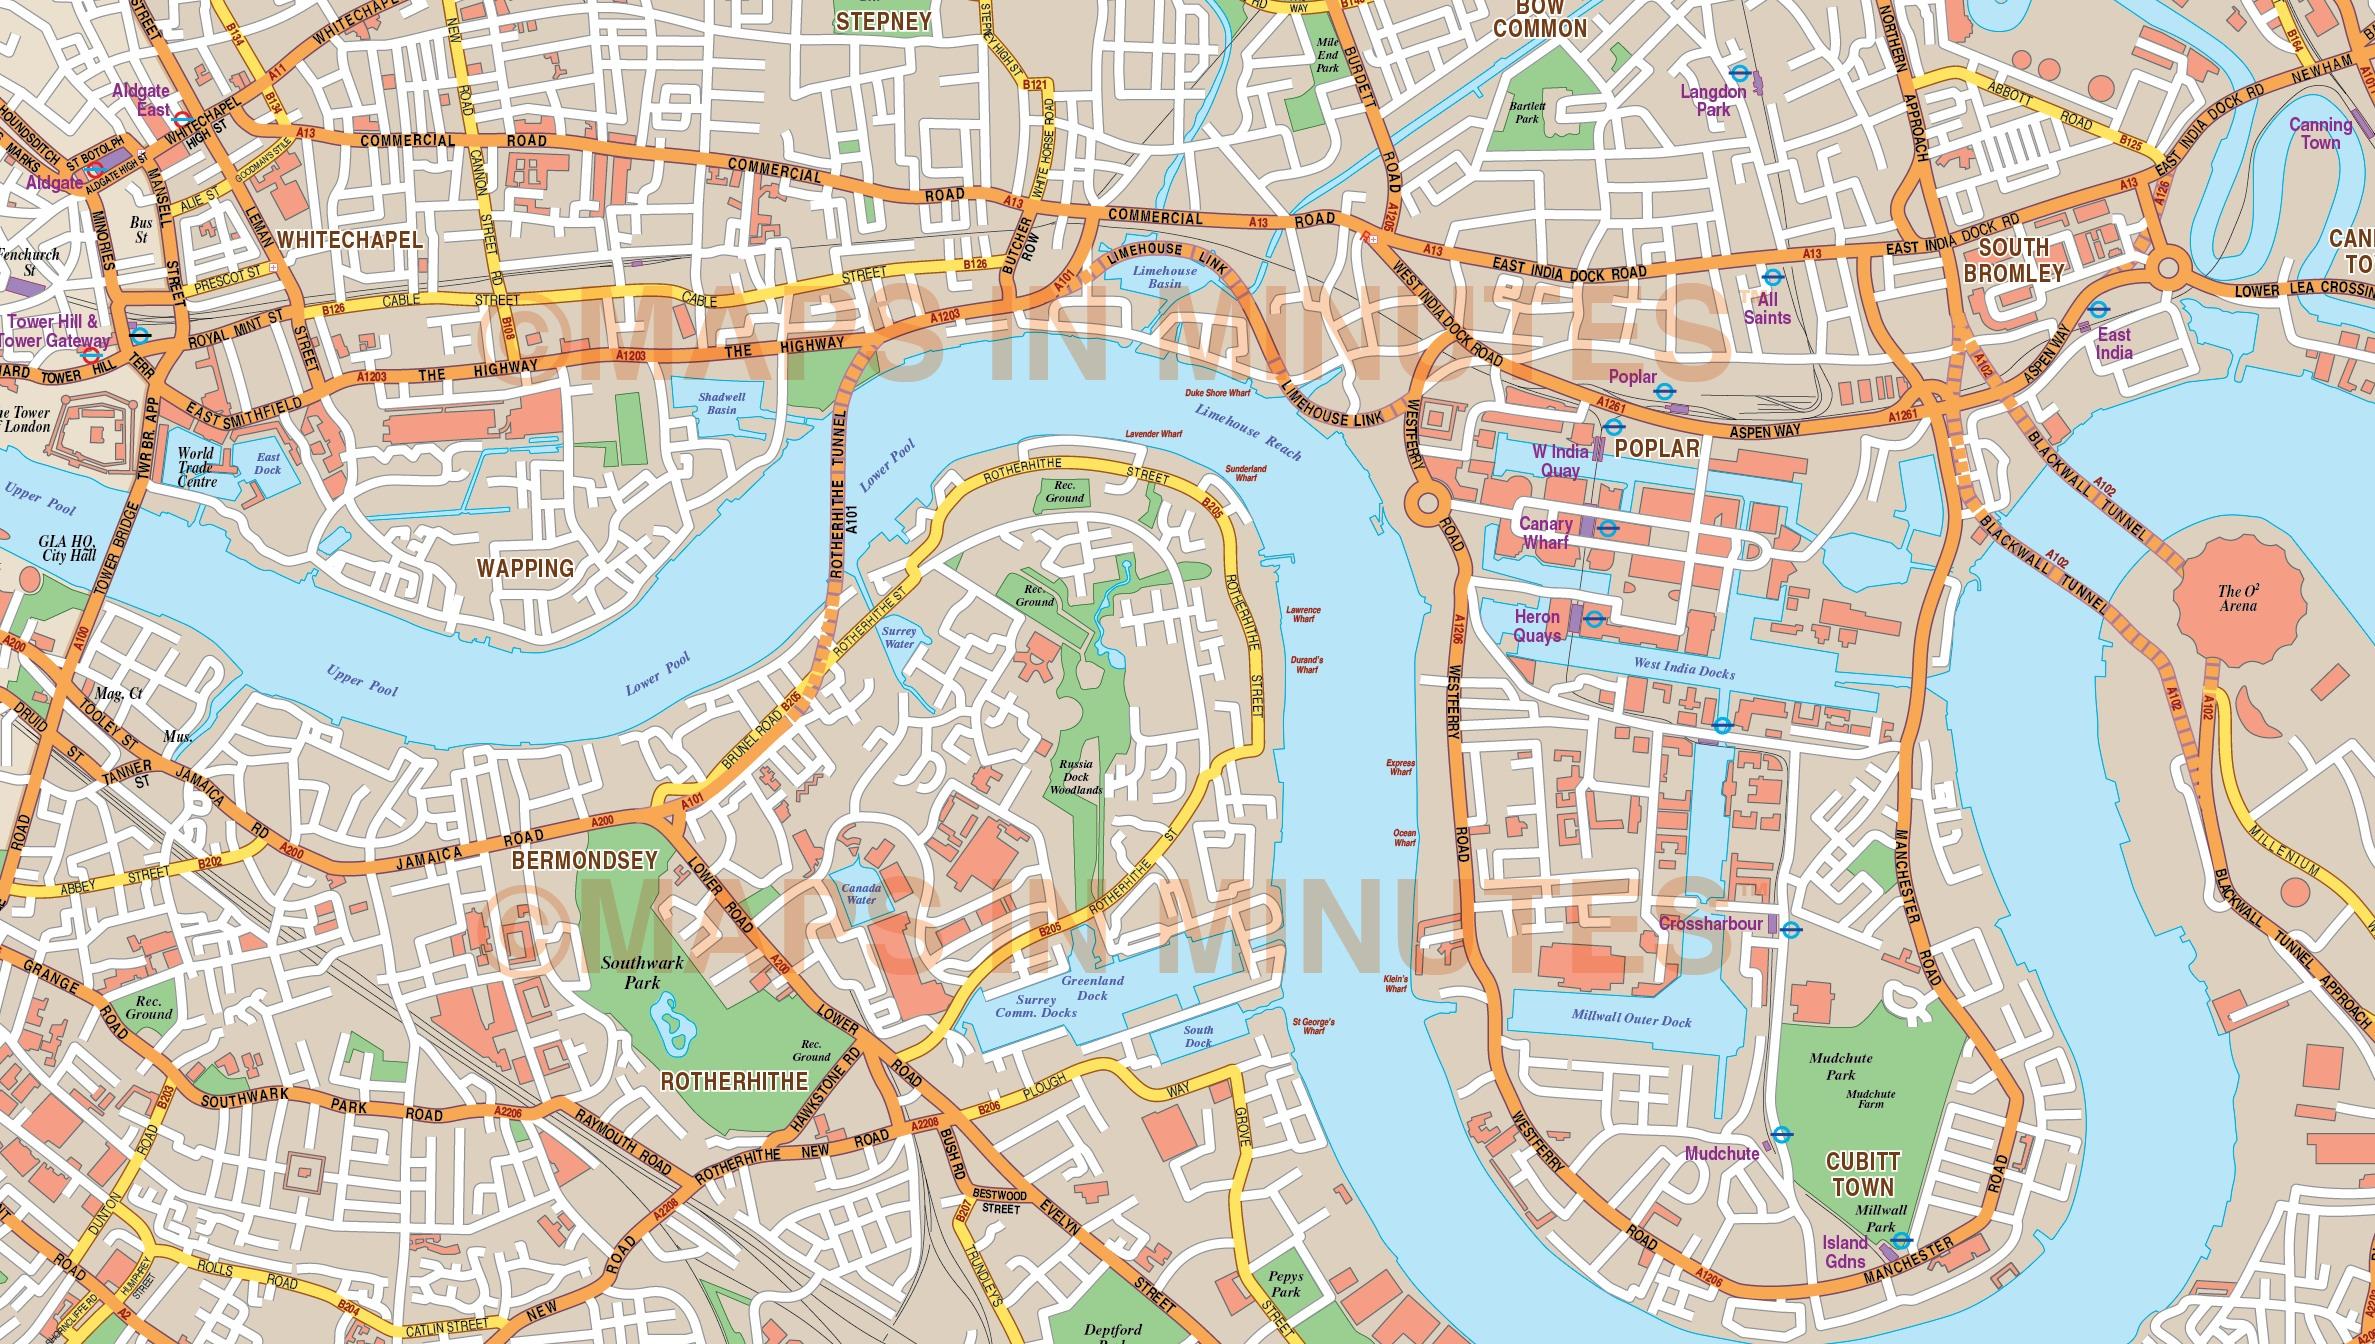 Basic Map Of London.London Large Base Map 10 000 Scale In Illustrator Cs Format